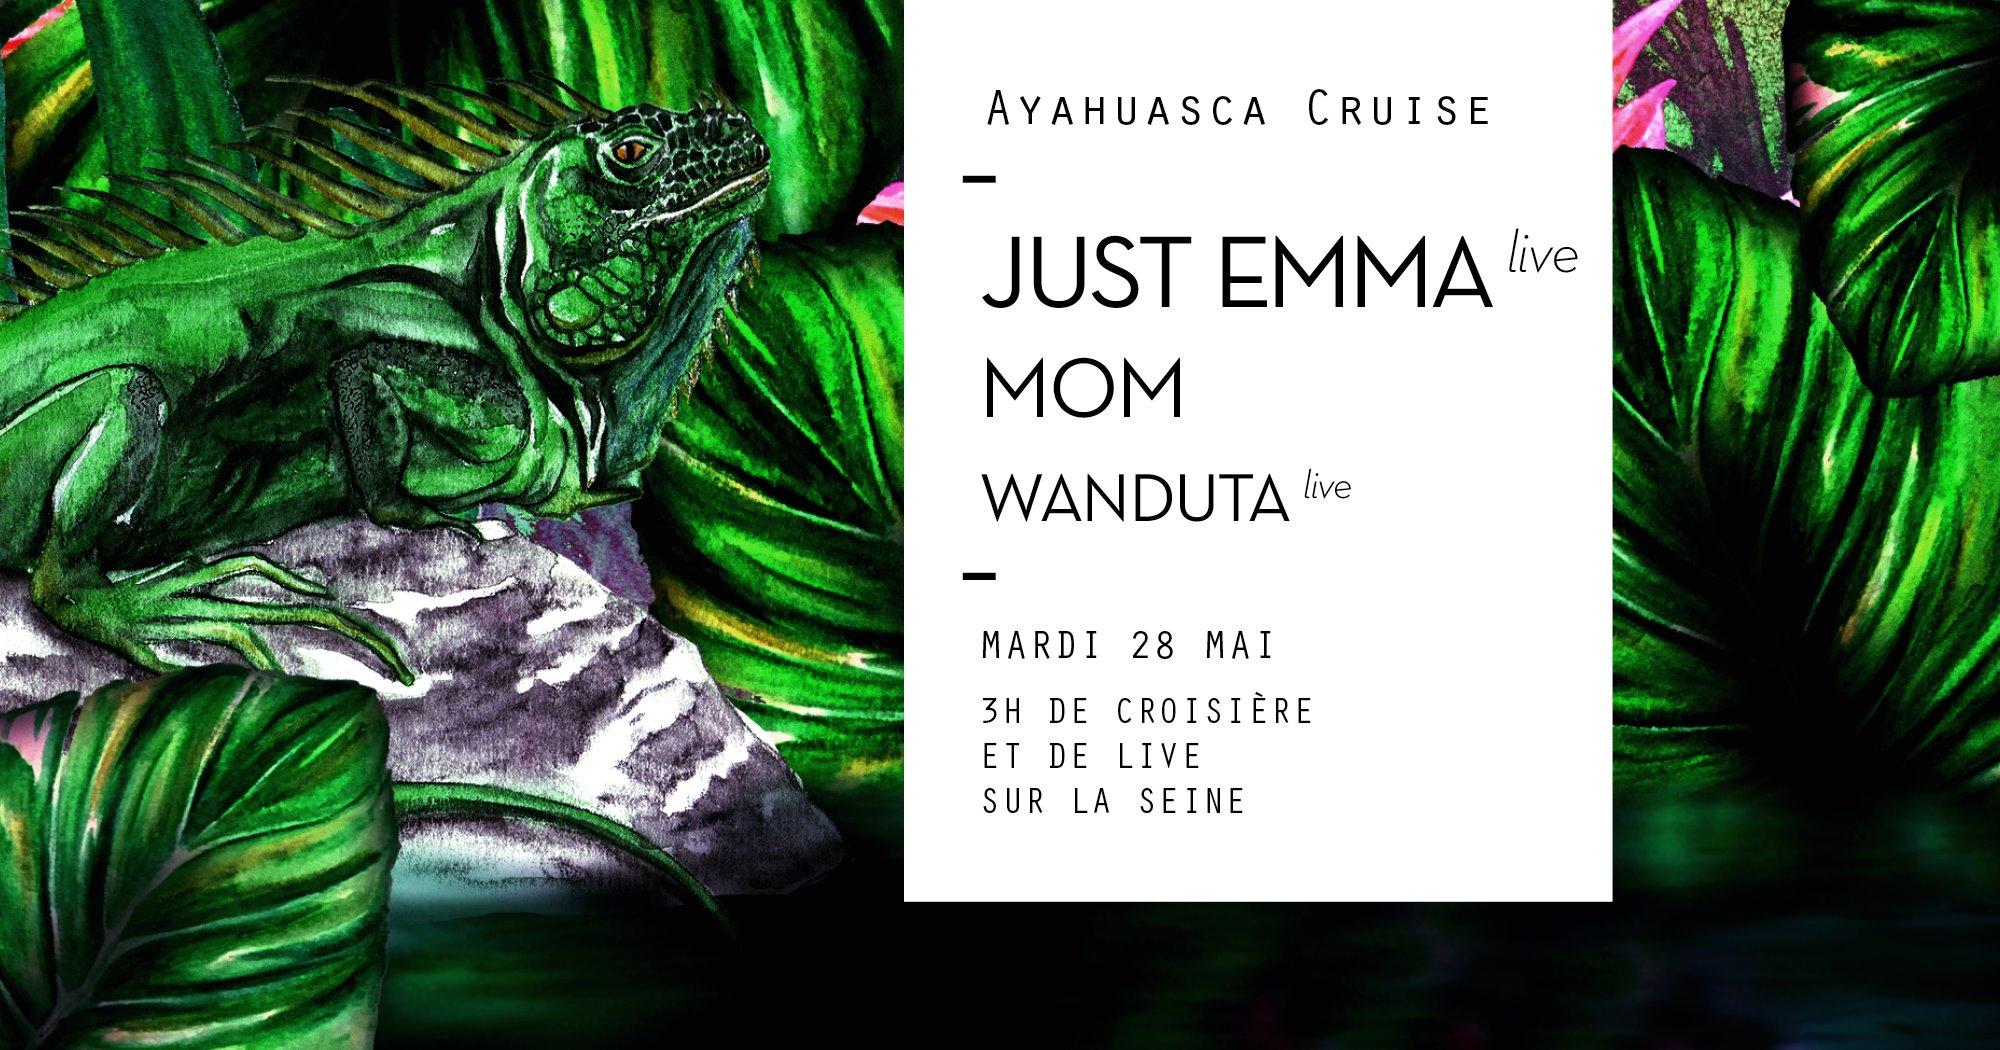 Ayahuasca Cruise : Just Emma Live, MoM, Wanduta Live